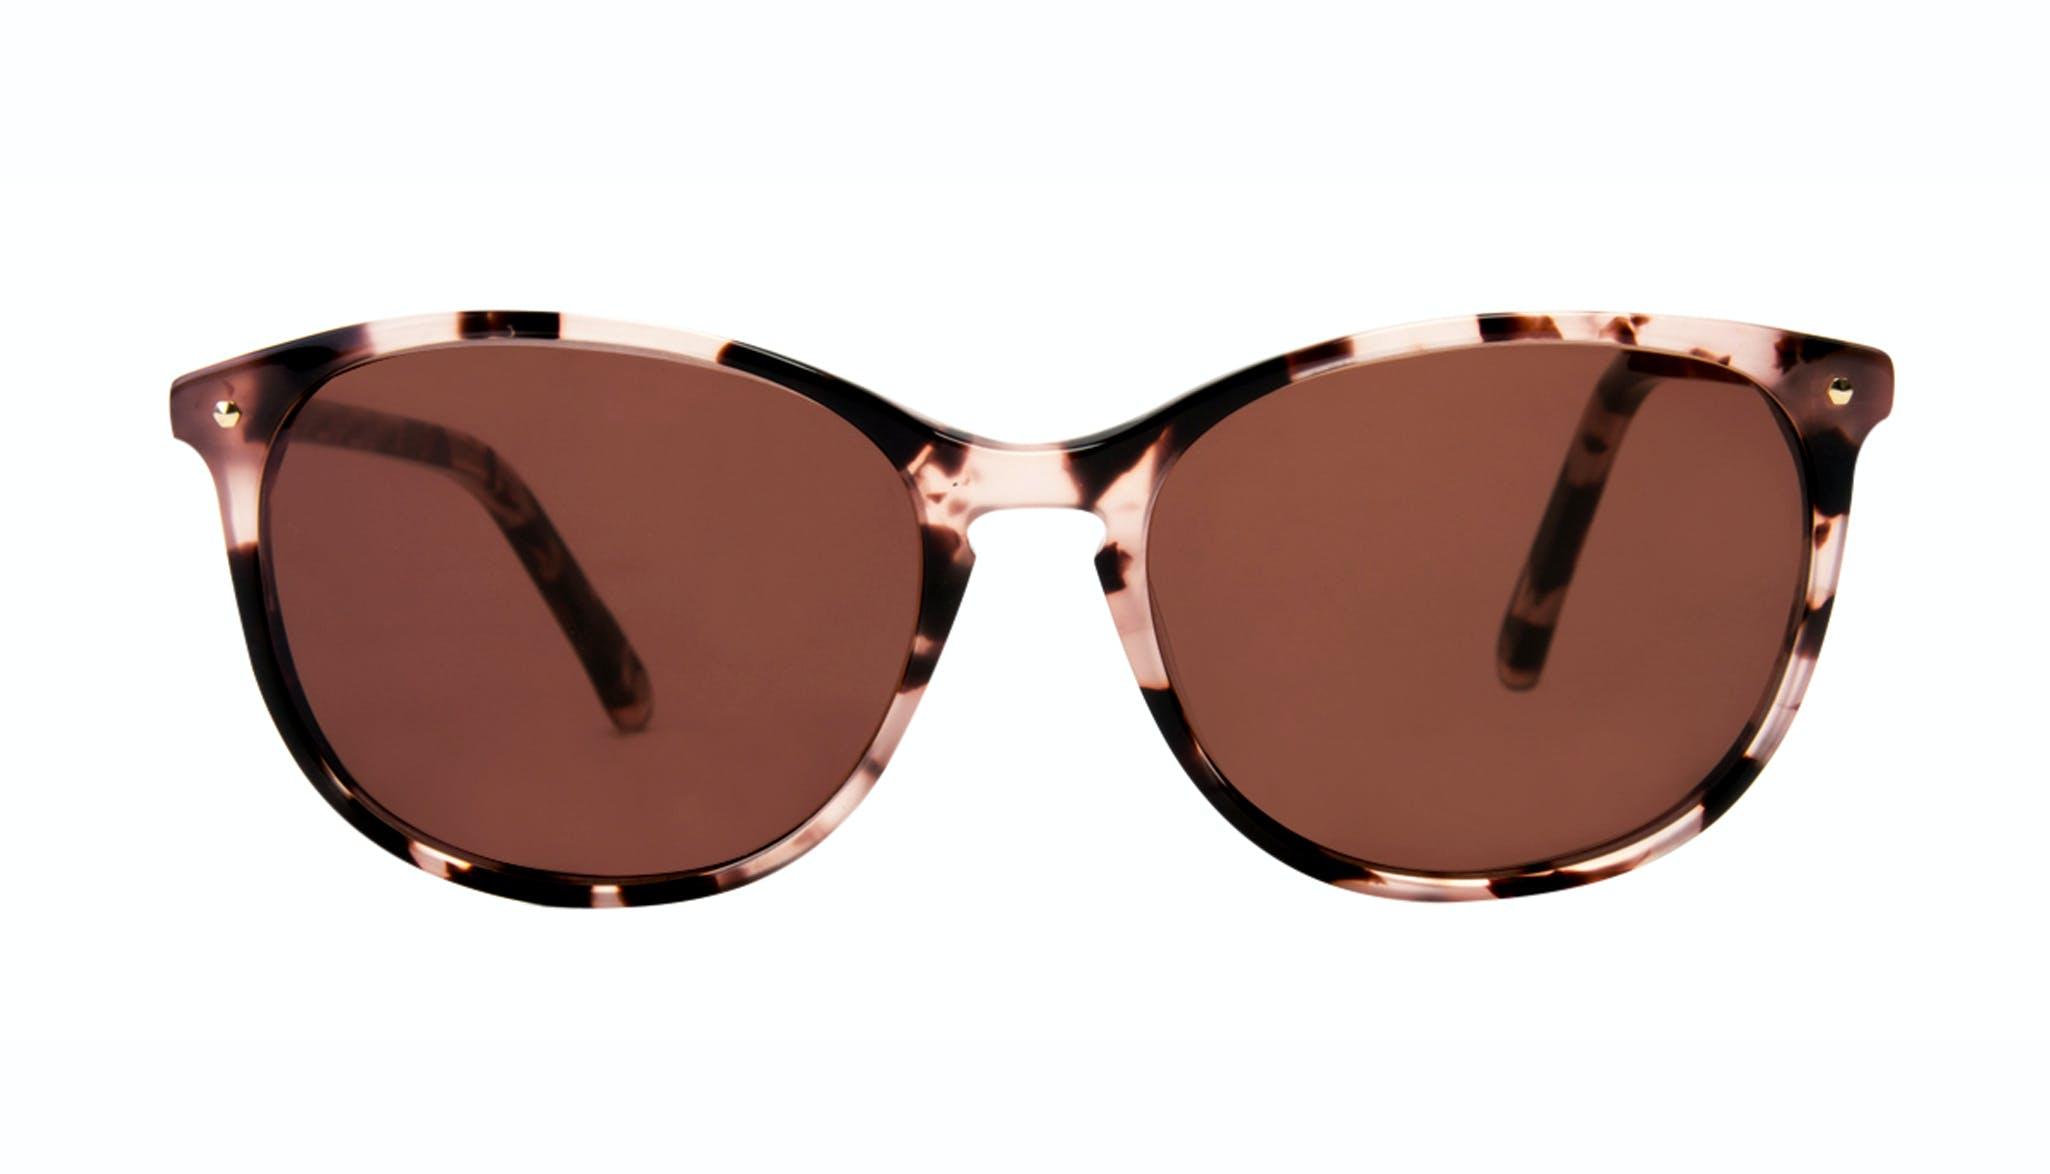 Affordable Fashion Glasses Rectangle Square Round Sunglasses Women Nadine Pink Tortoise